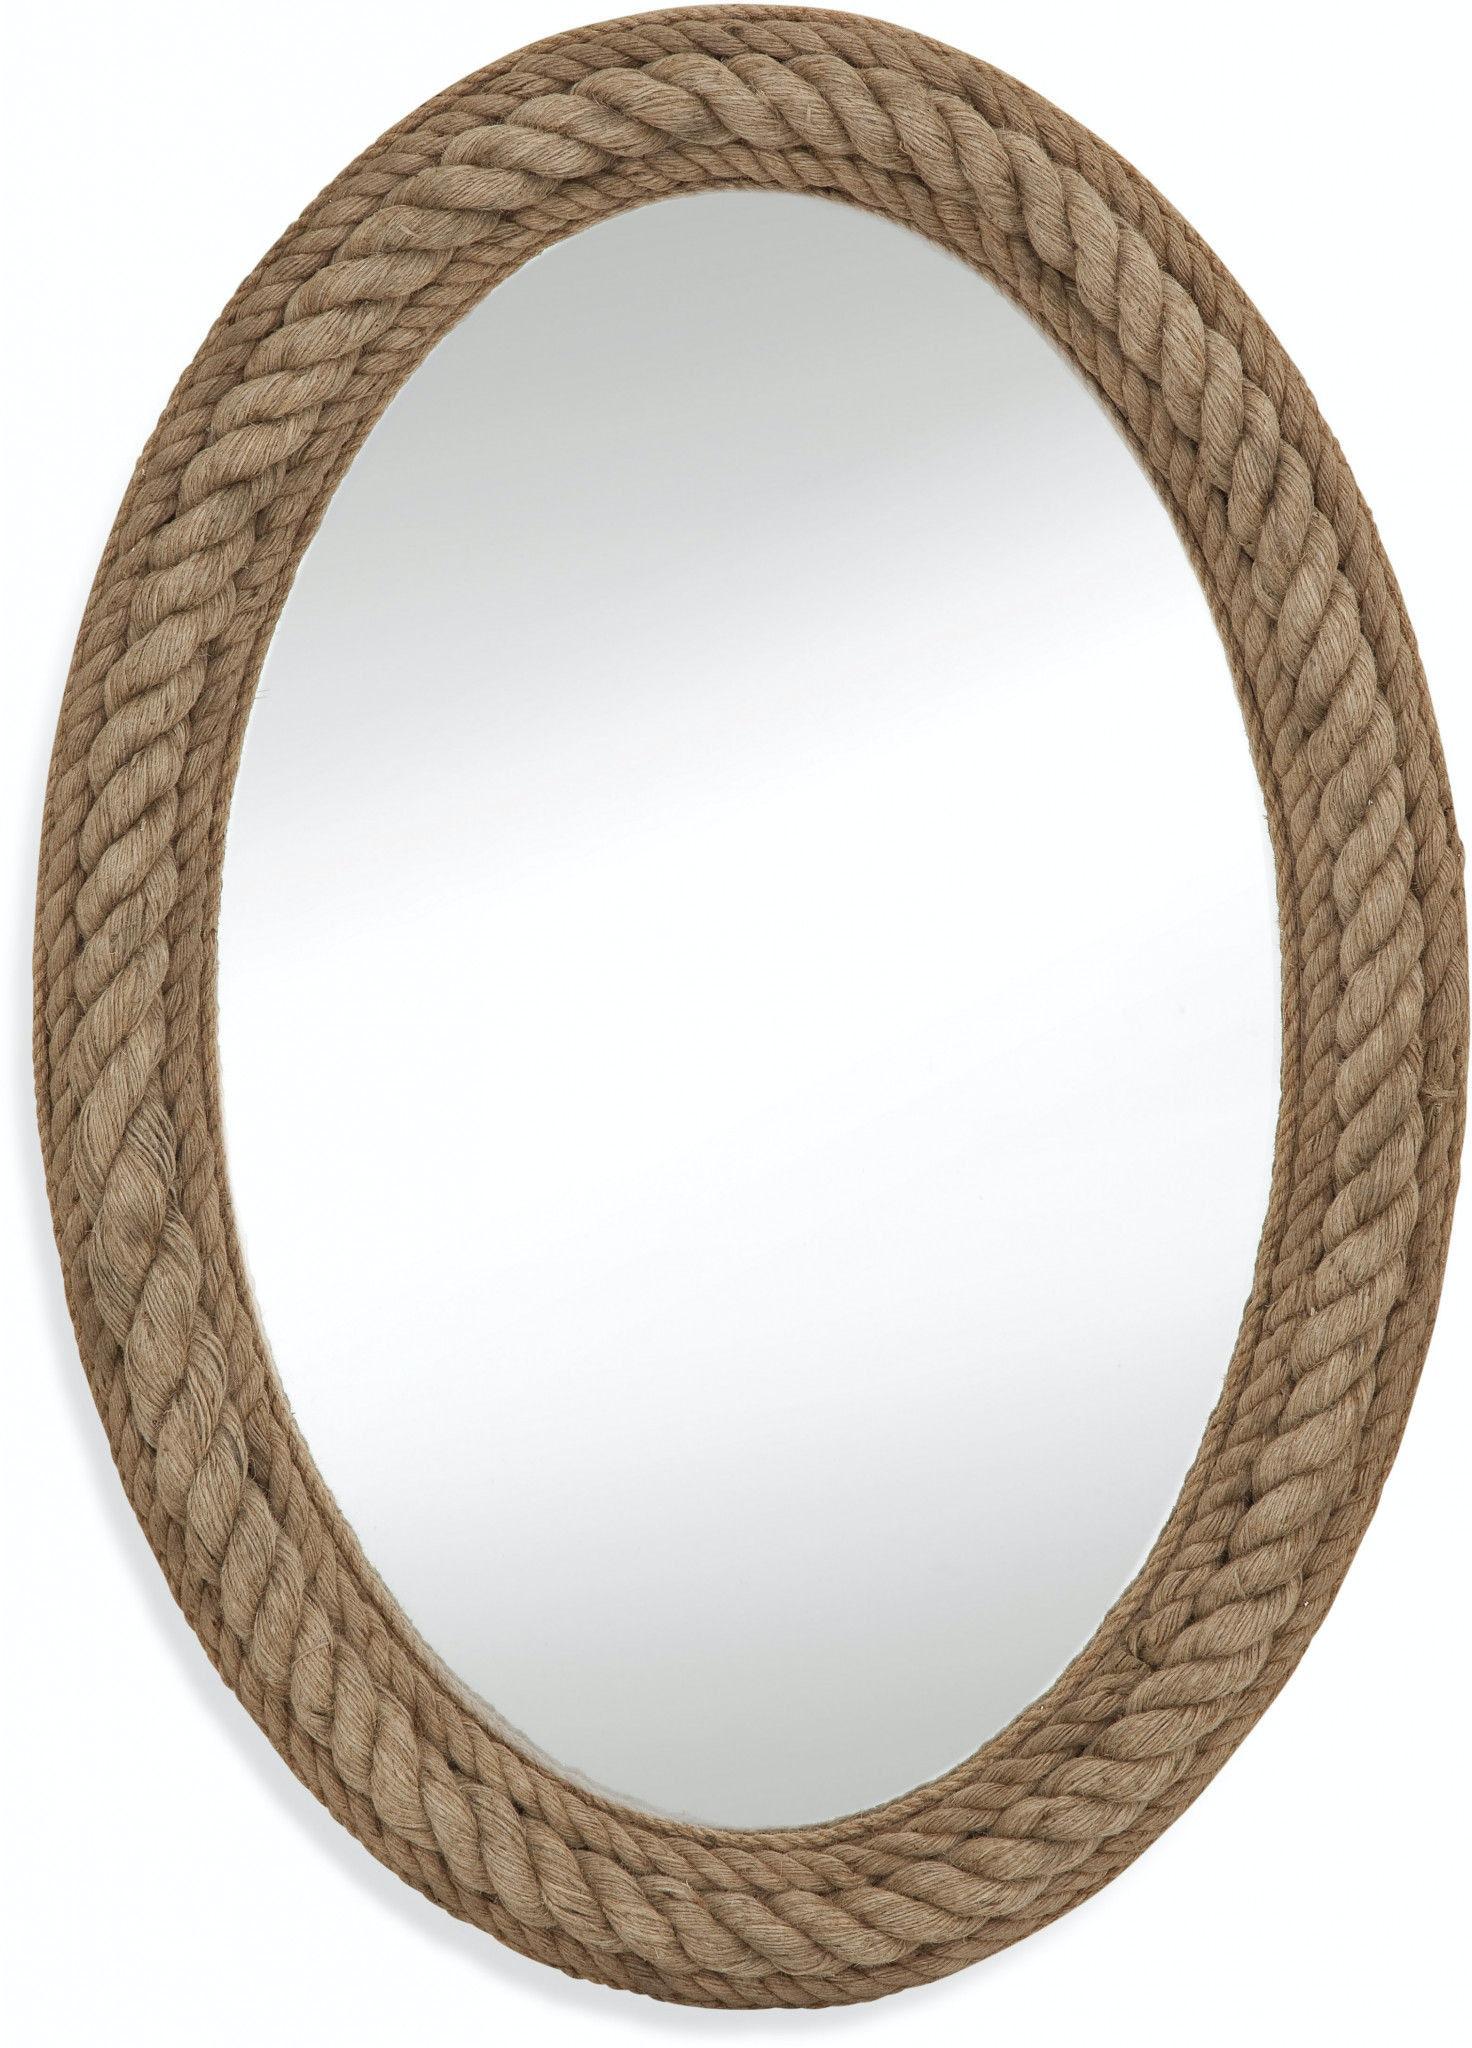 Bassett Mirror Company Accessories Rope Wall Mirror